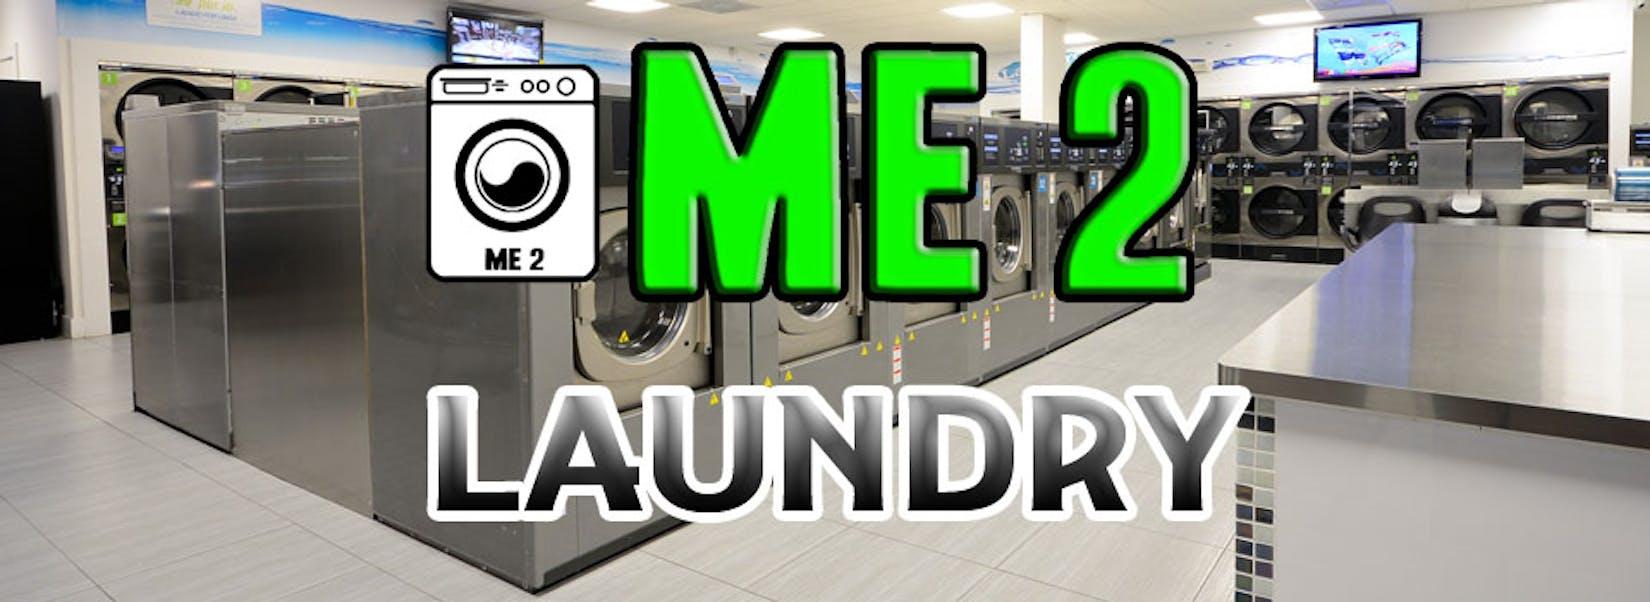 Me2 Laundry   Beauty